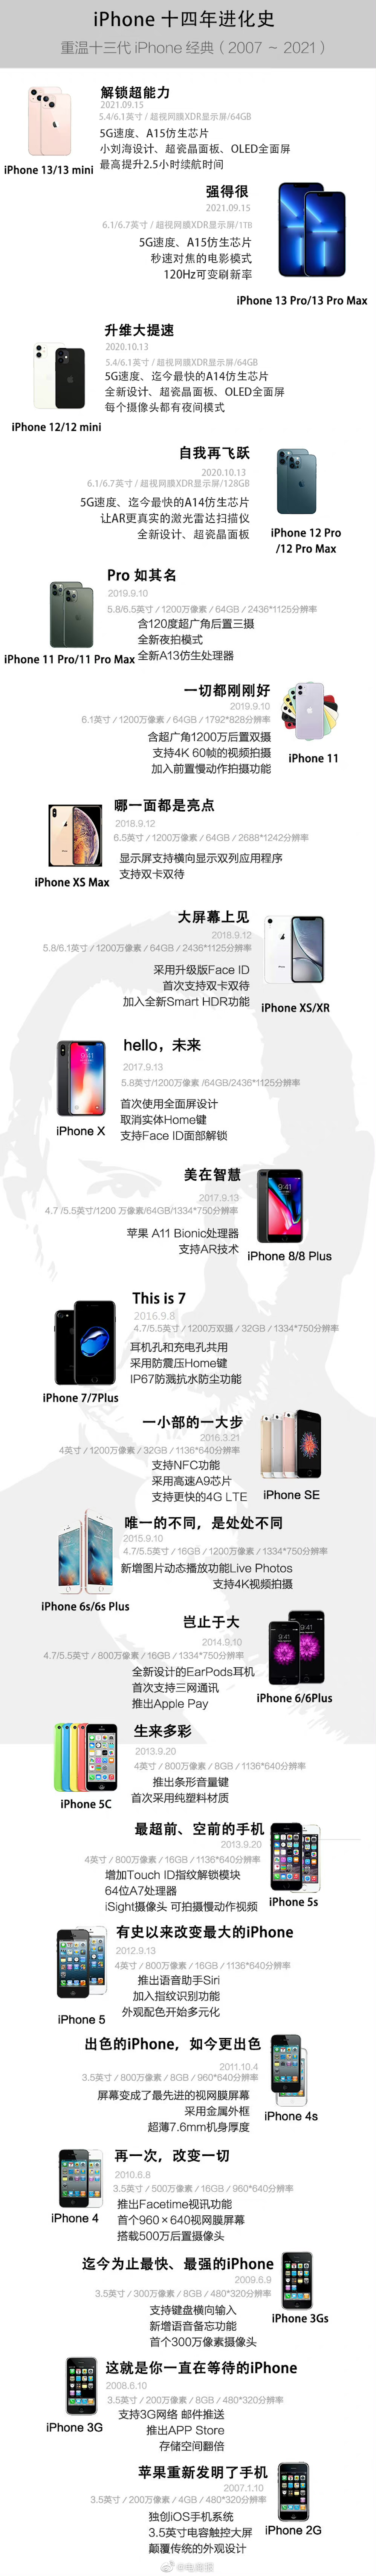 iPhone 13抢断货!苹果市值却一夜蒸发近3000亿,机构表示仍看好